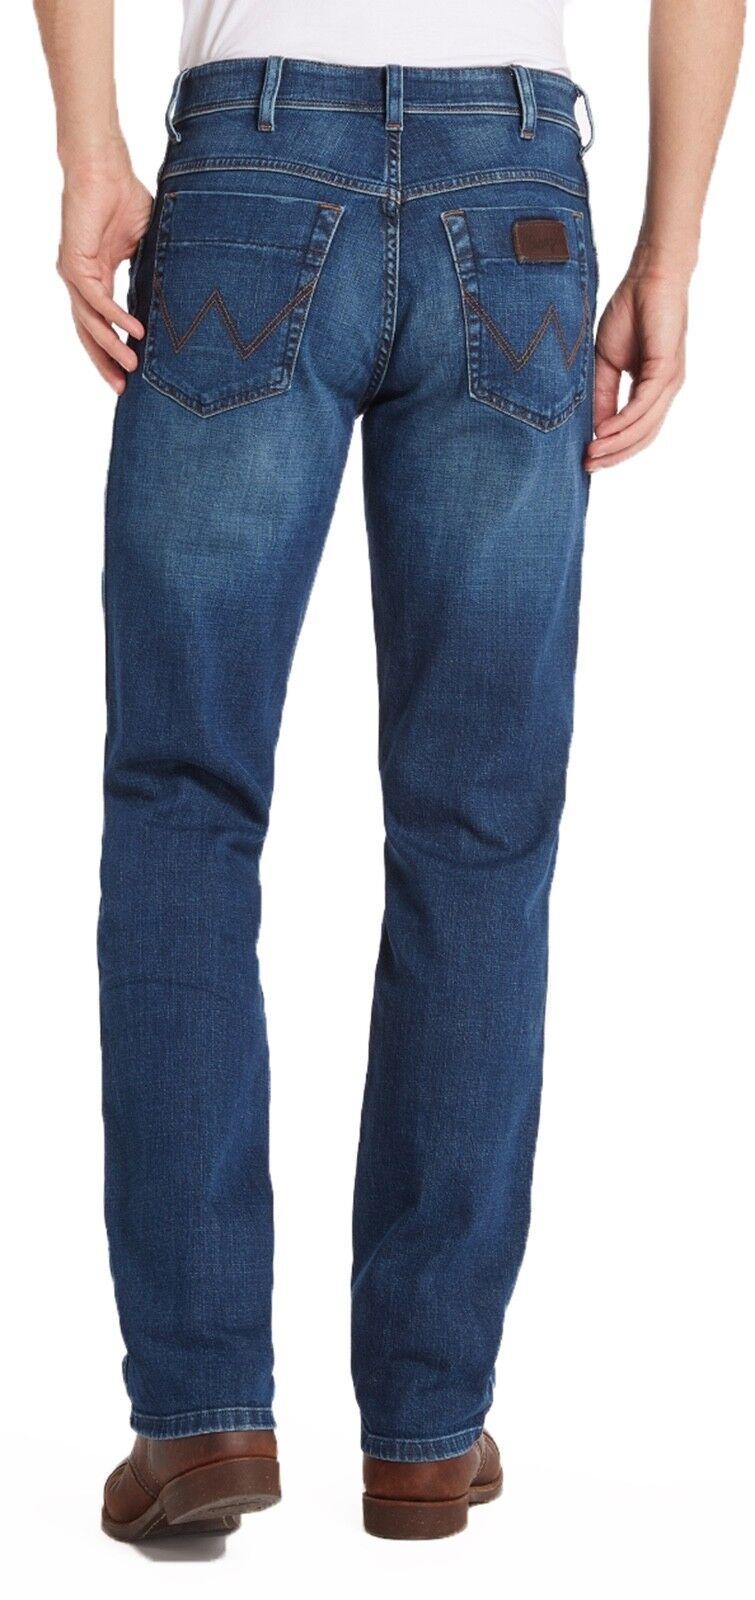 Wrangler Texas Stretch Jeans Mens Regular Blue Used Vintage Blue Faded Denim